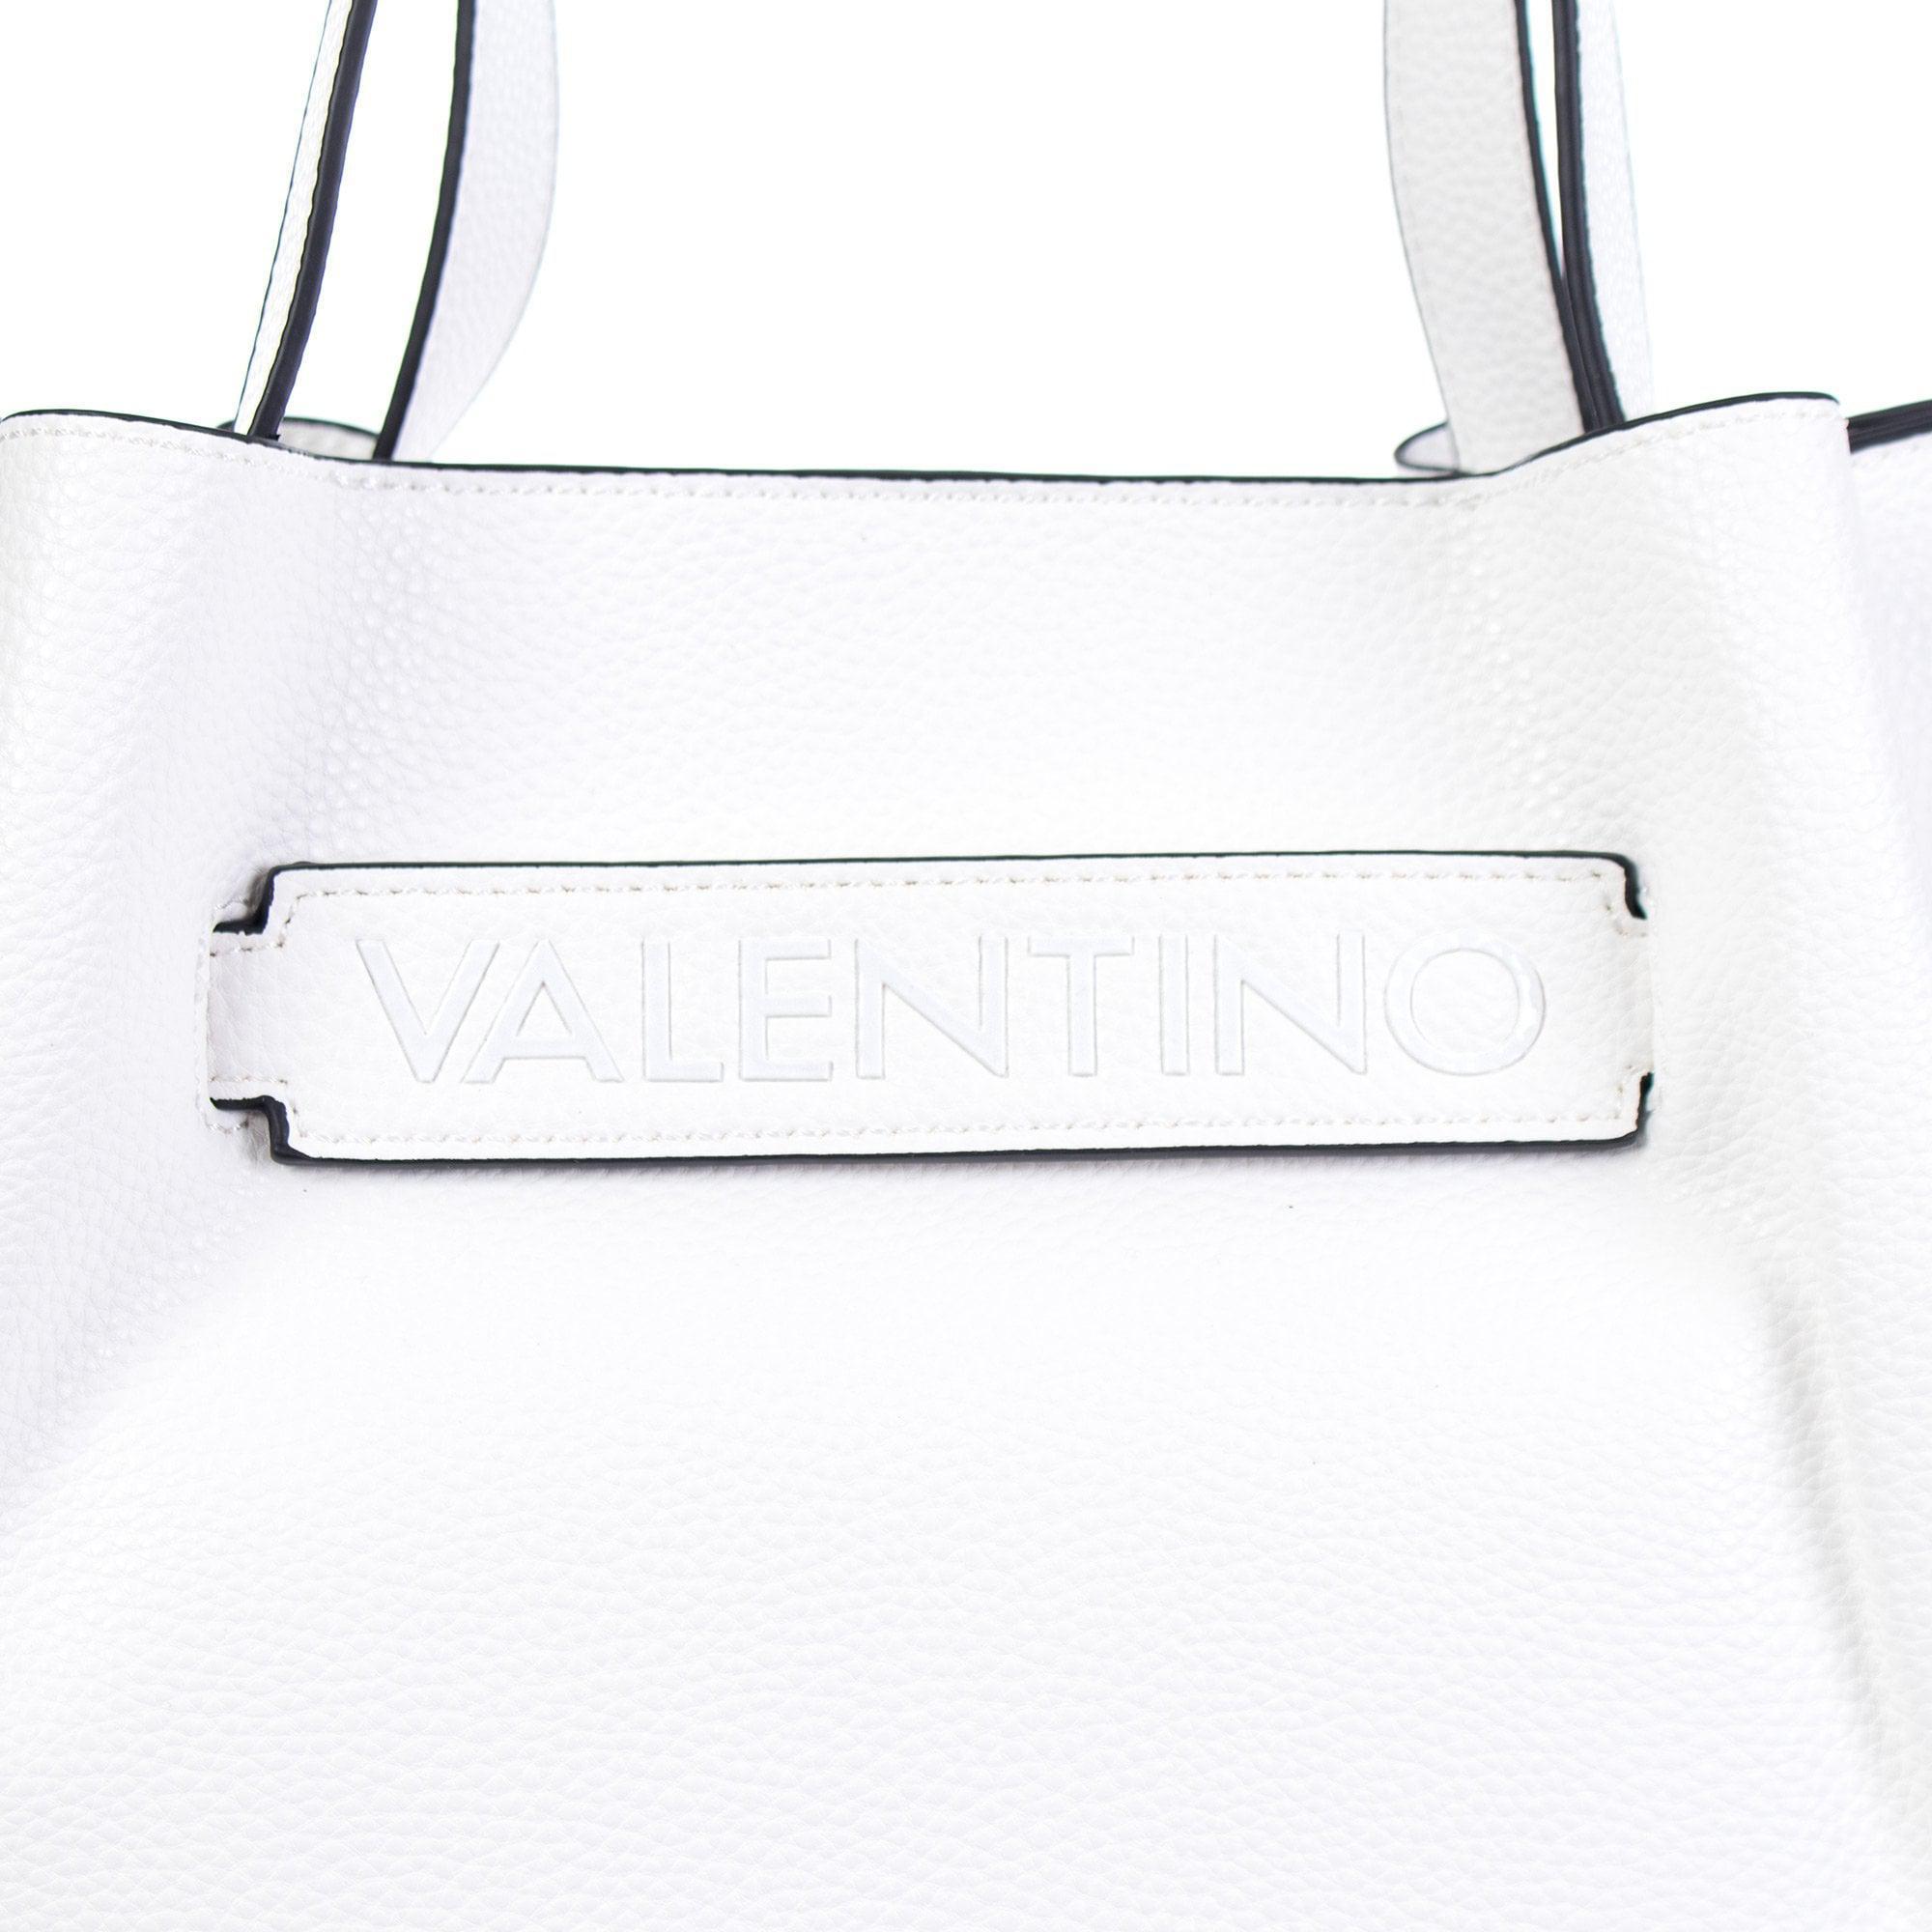 e2fbbd0558d2 Valentino Vbs2zh01 - Melody Tote in White - Lyst